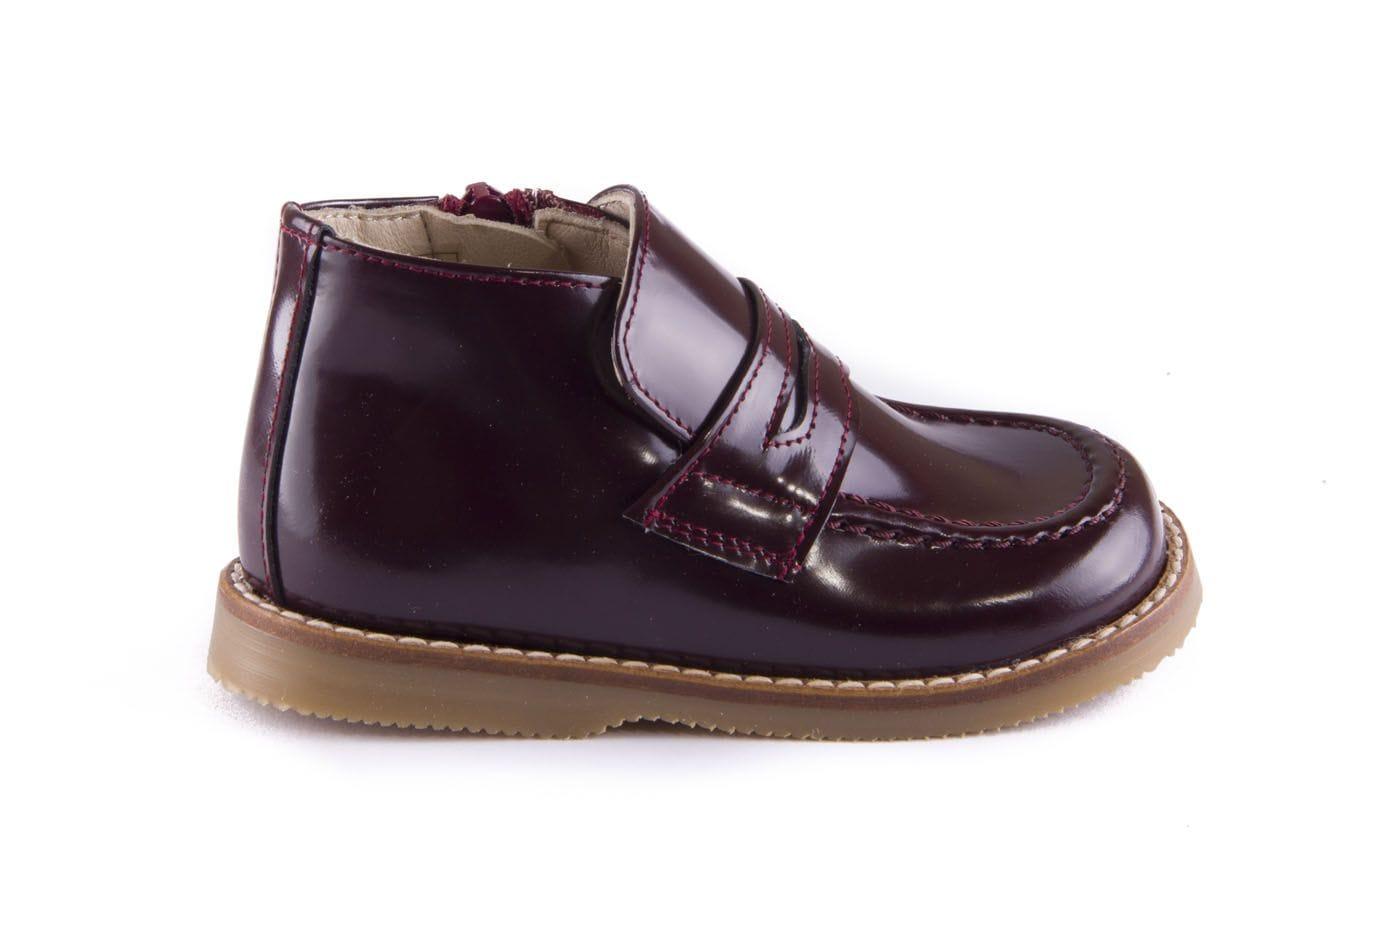 c496bb08 Comprar zapato tipo JOVEN NIÑO estilo BOTAS COLOR MARRON FLORENTIN ...